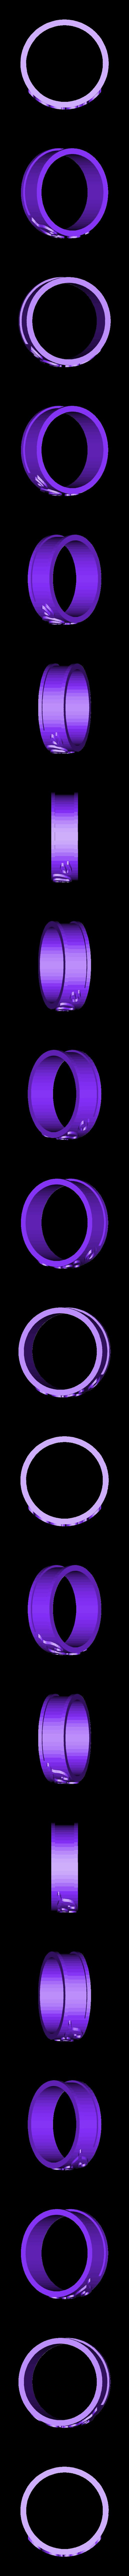 anillo love 20 cerrado hendidura 2.stl Télécharger fichier STL gratuit Anillo / Ring Love • Design pour impression 3D, amg3D